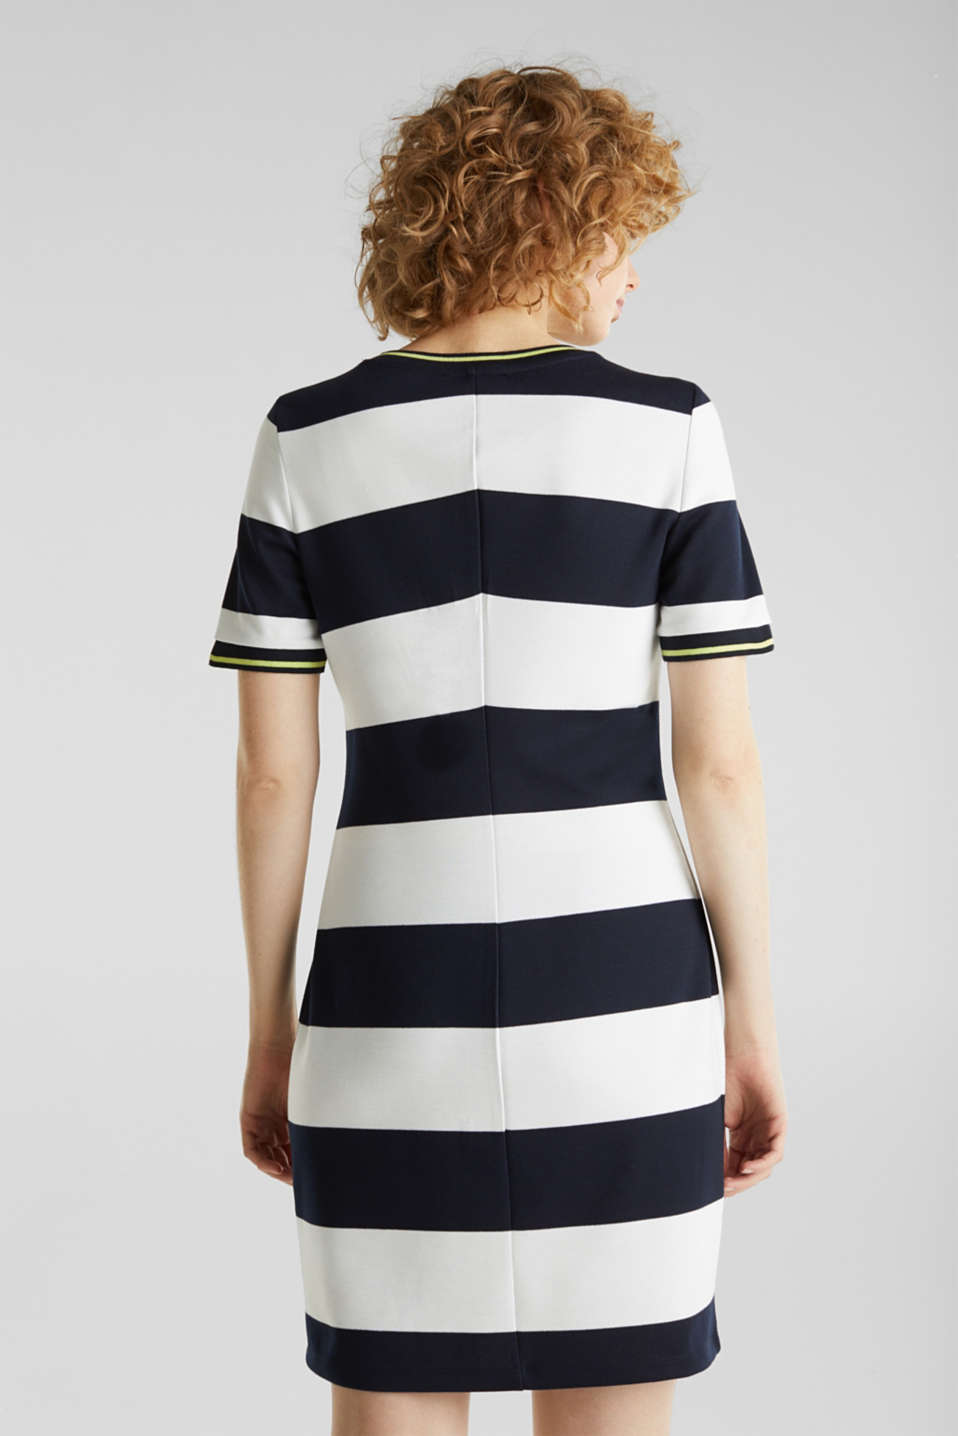 NEON piqué dress with luminous stripes, NAVY, detail image number 2